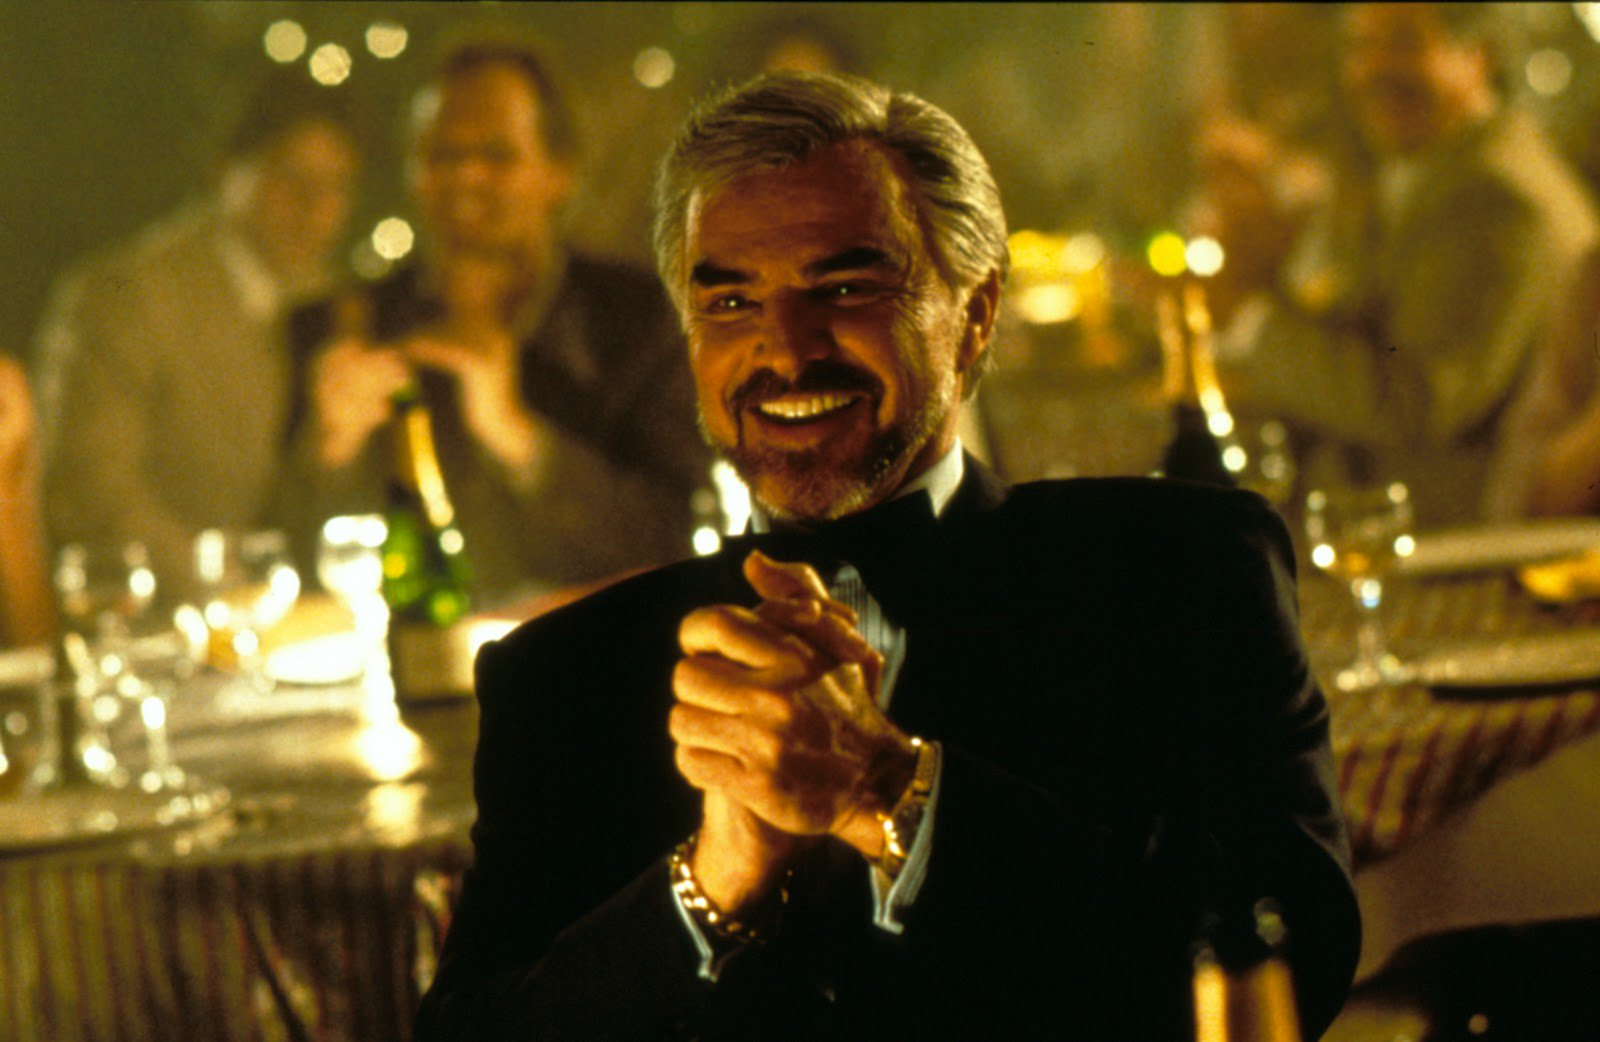 Happy birthday to one hell of an actor, Oscar-nominee/Emmy-winner Burt Reynolds!